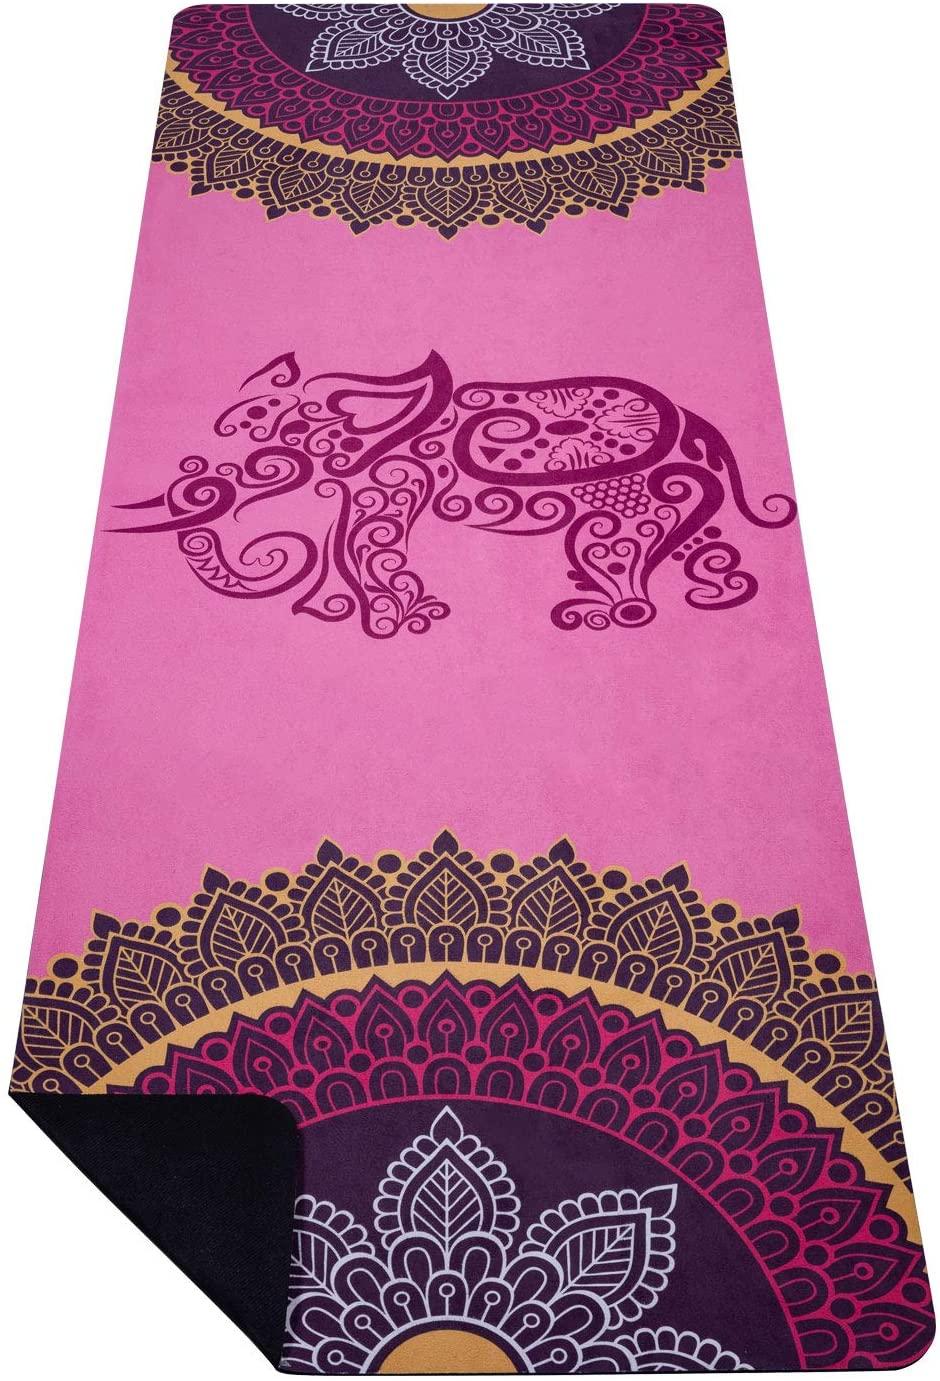 SNΛKUGΛ Yoga Mat - Premium 3.5MM Print Suede & Eco-Friendly Natural Rubber Non Slip Exercise & Fitness Mat for Yoga, Pilates, Bikram, Ashtanga (72